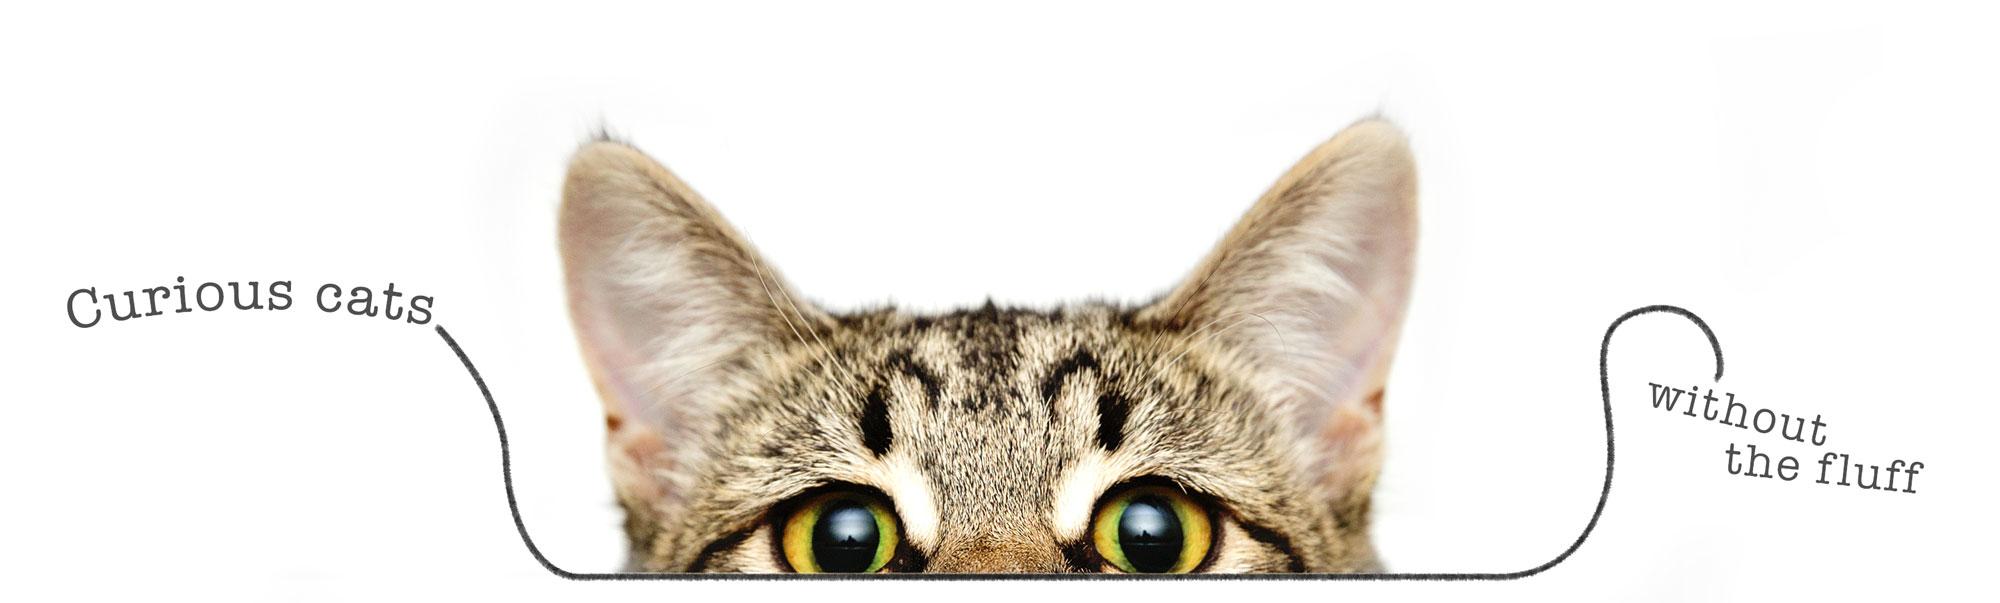 CuriousCat.jpg